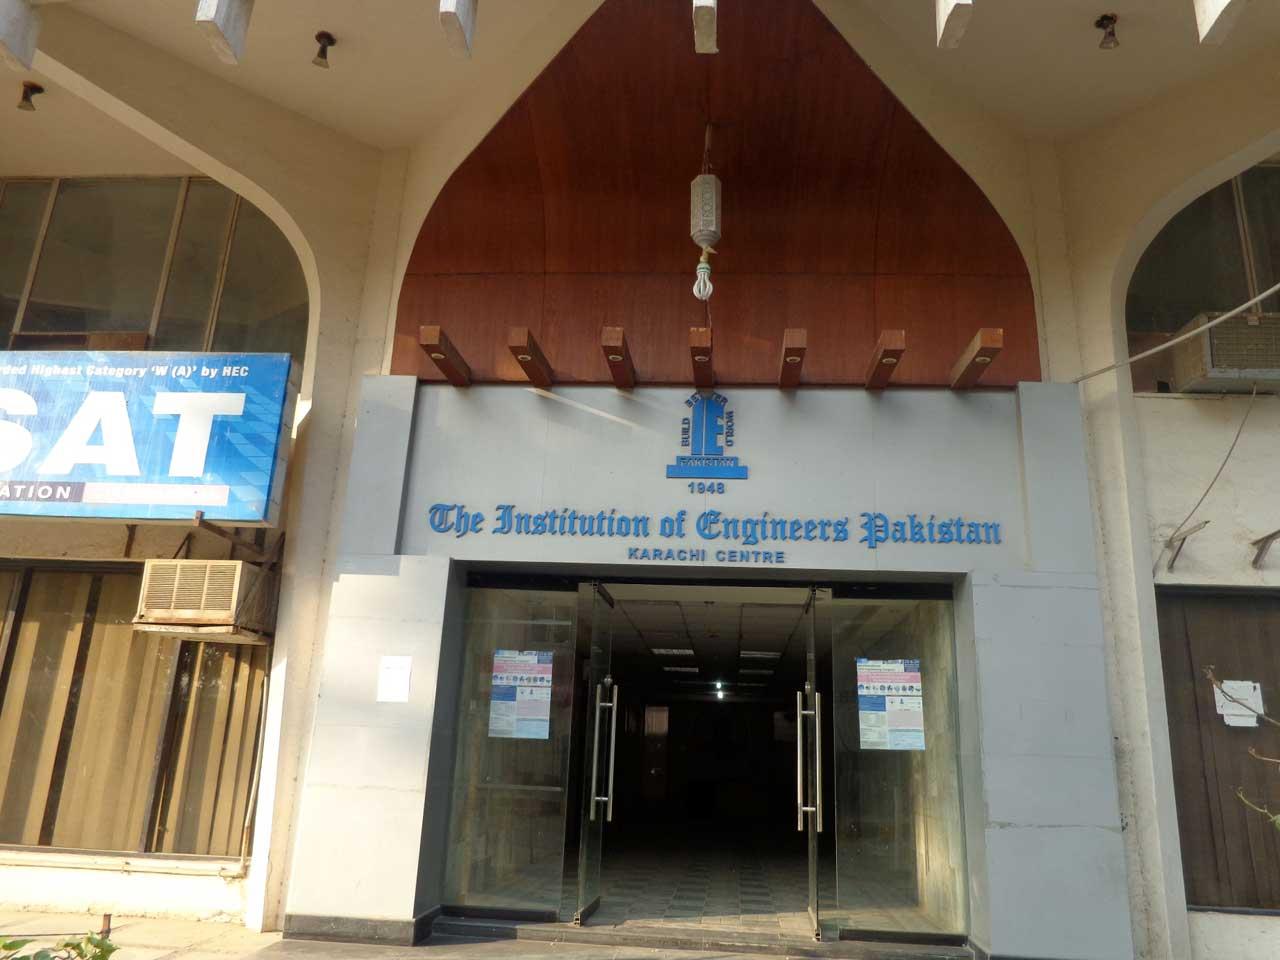 Entrance to IEP Building in Karachi